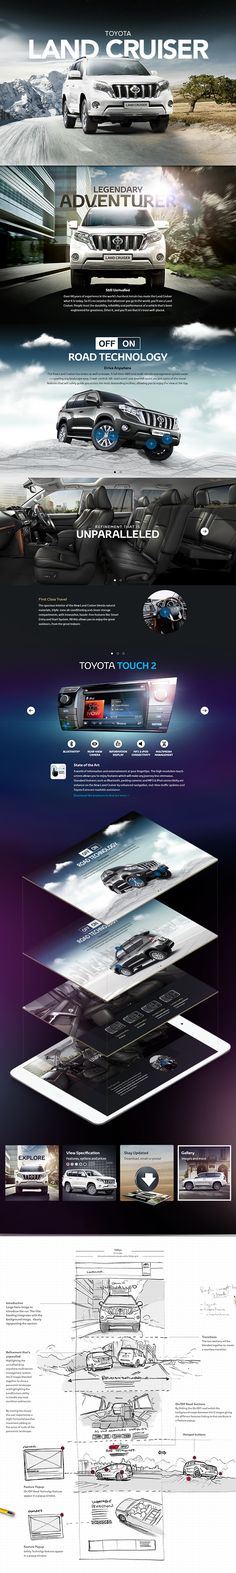 Cool Automotive Web Design. Toyota. #automotive #webdesign [http://www.pinterest.com/alfredchong/] #webdesign #website #inspiration #layout